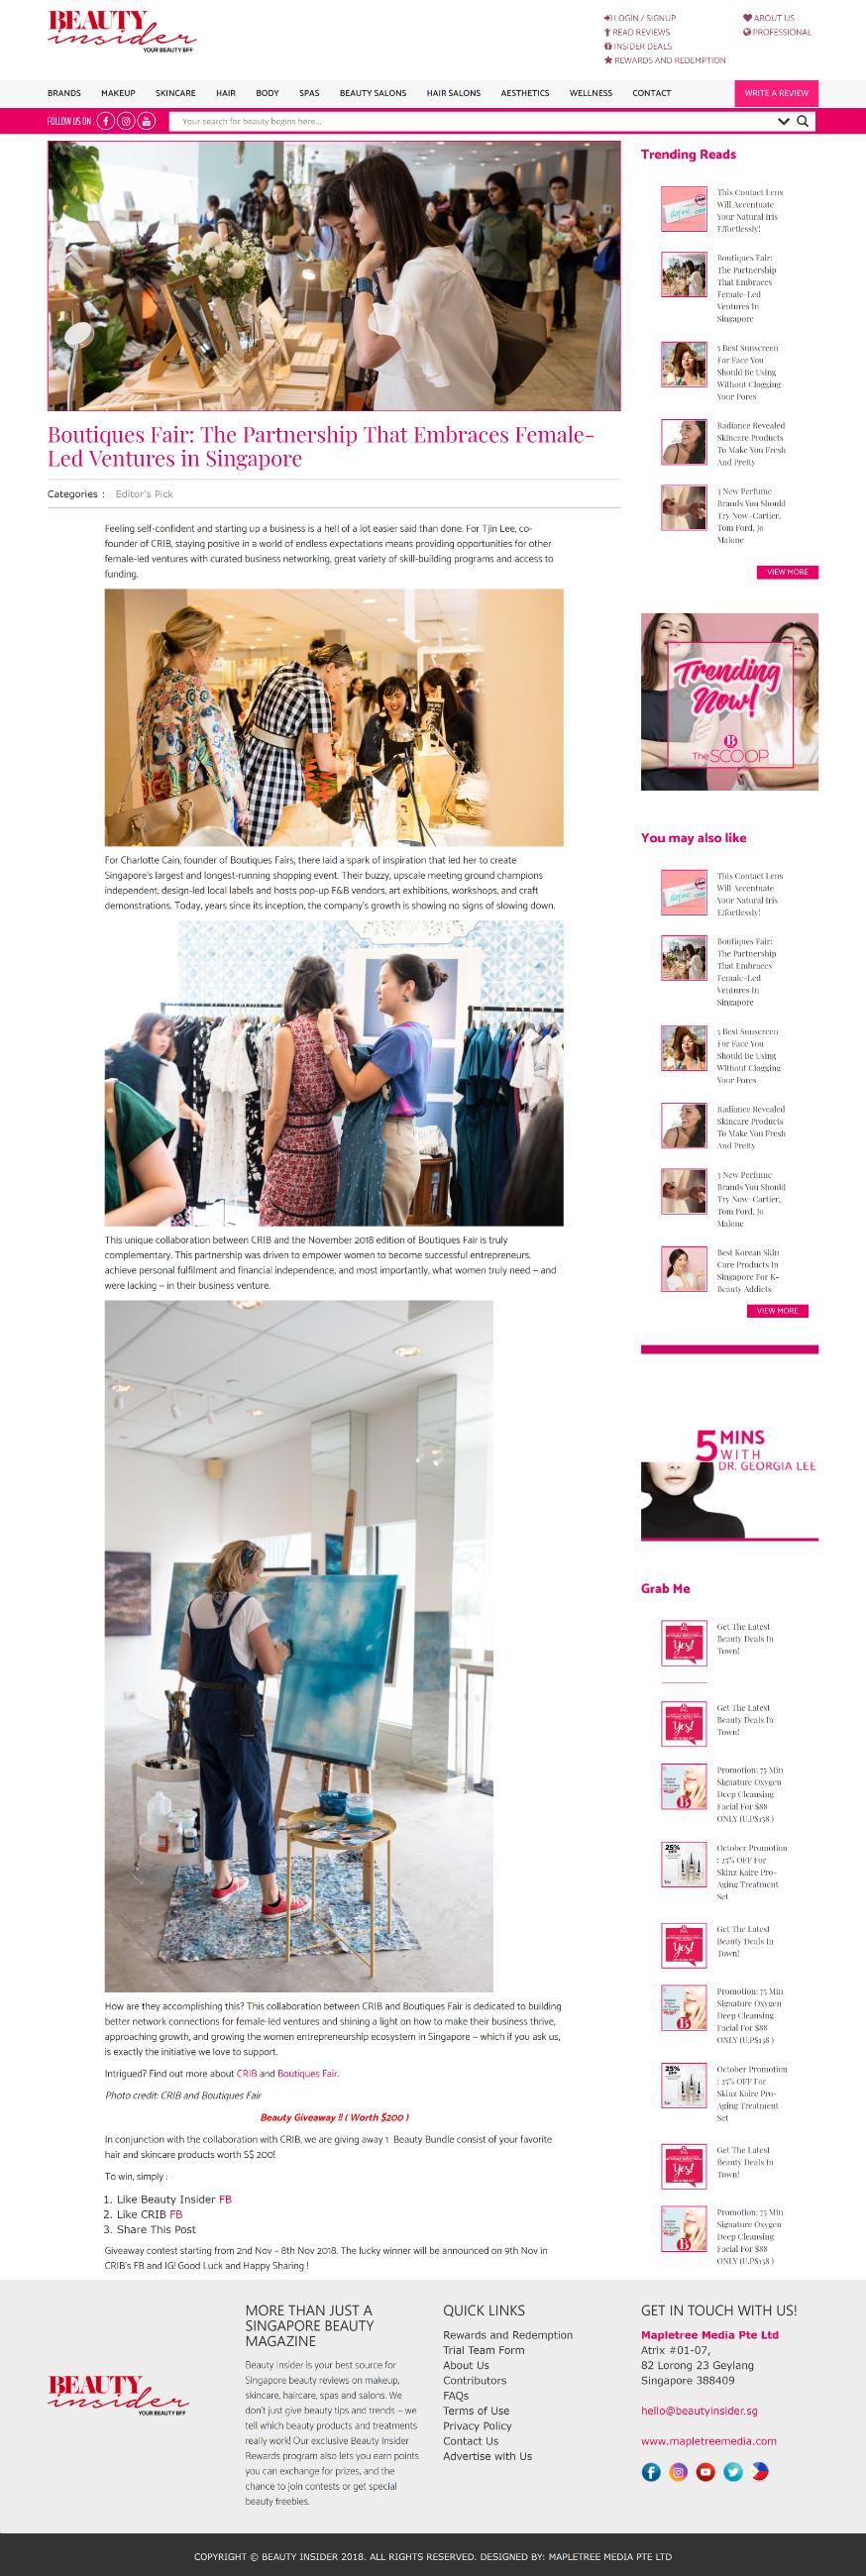 screencapture-beautyinsider-sg-crib-boutiques-fair-female-led-ventures-singapore-2018-11-01-21_18_29.png